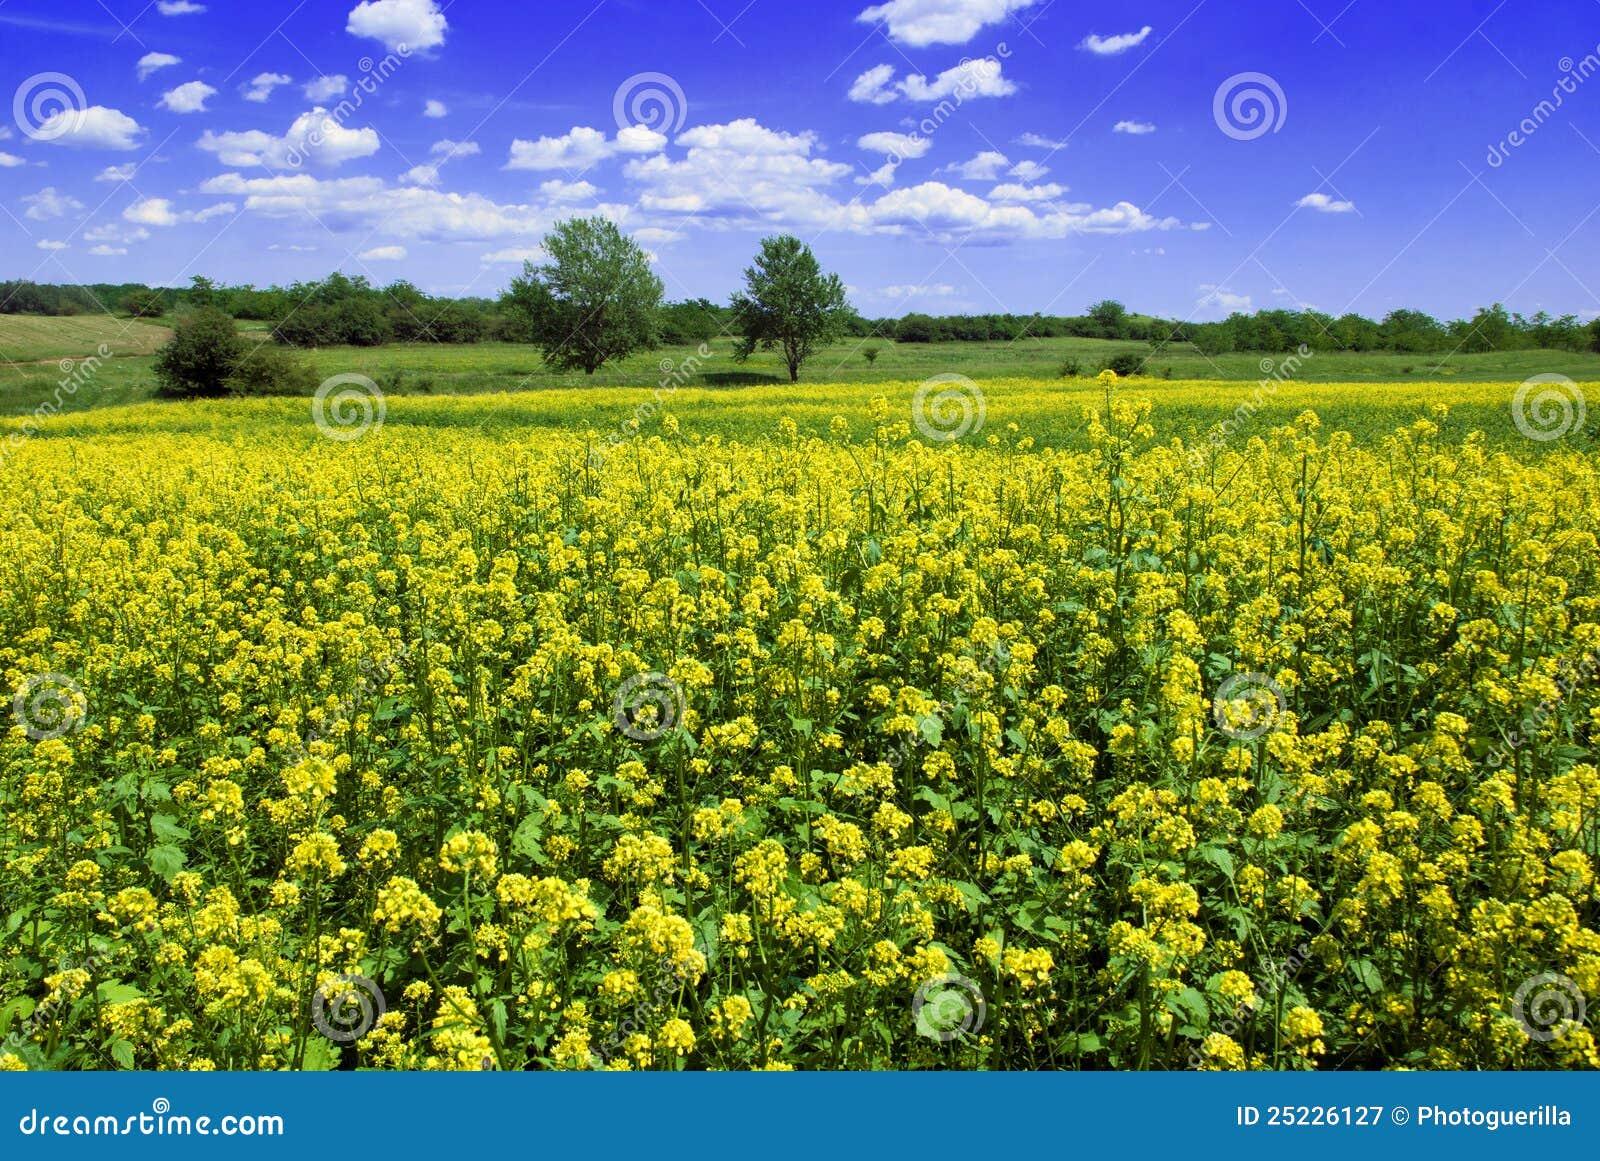 Mooi mosterdgebied